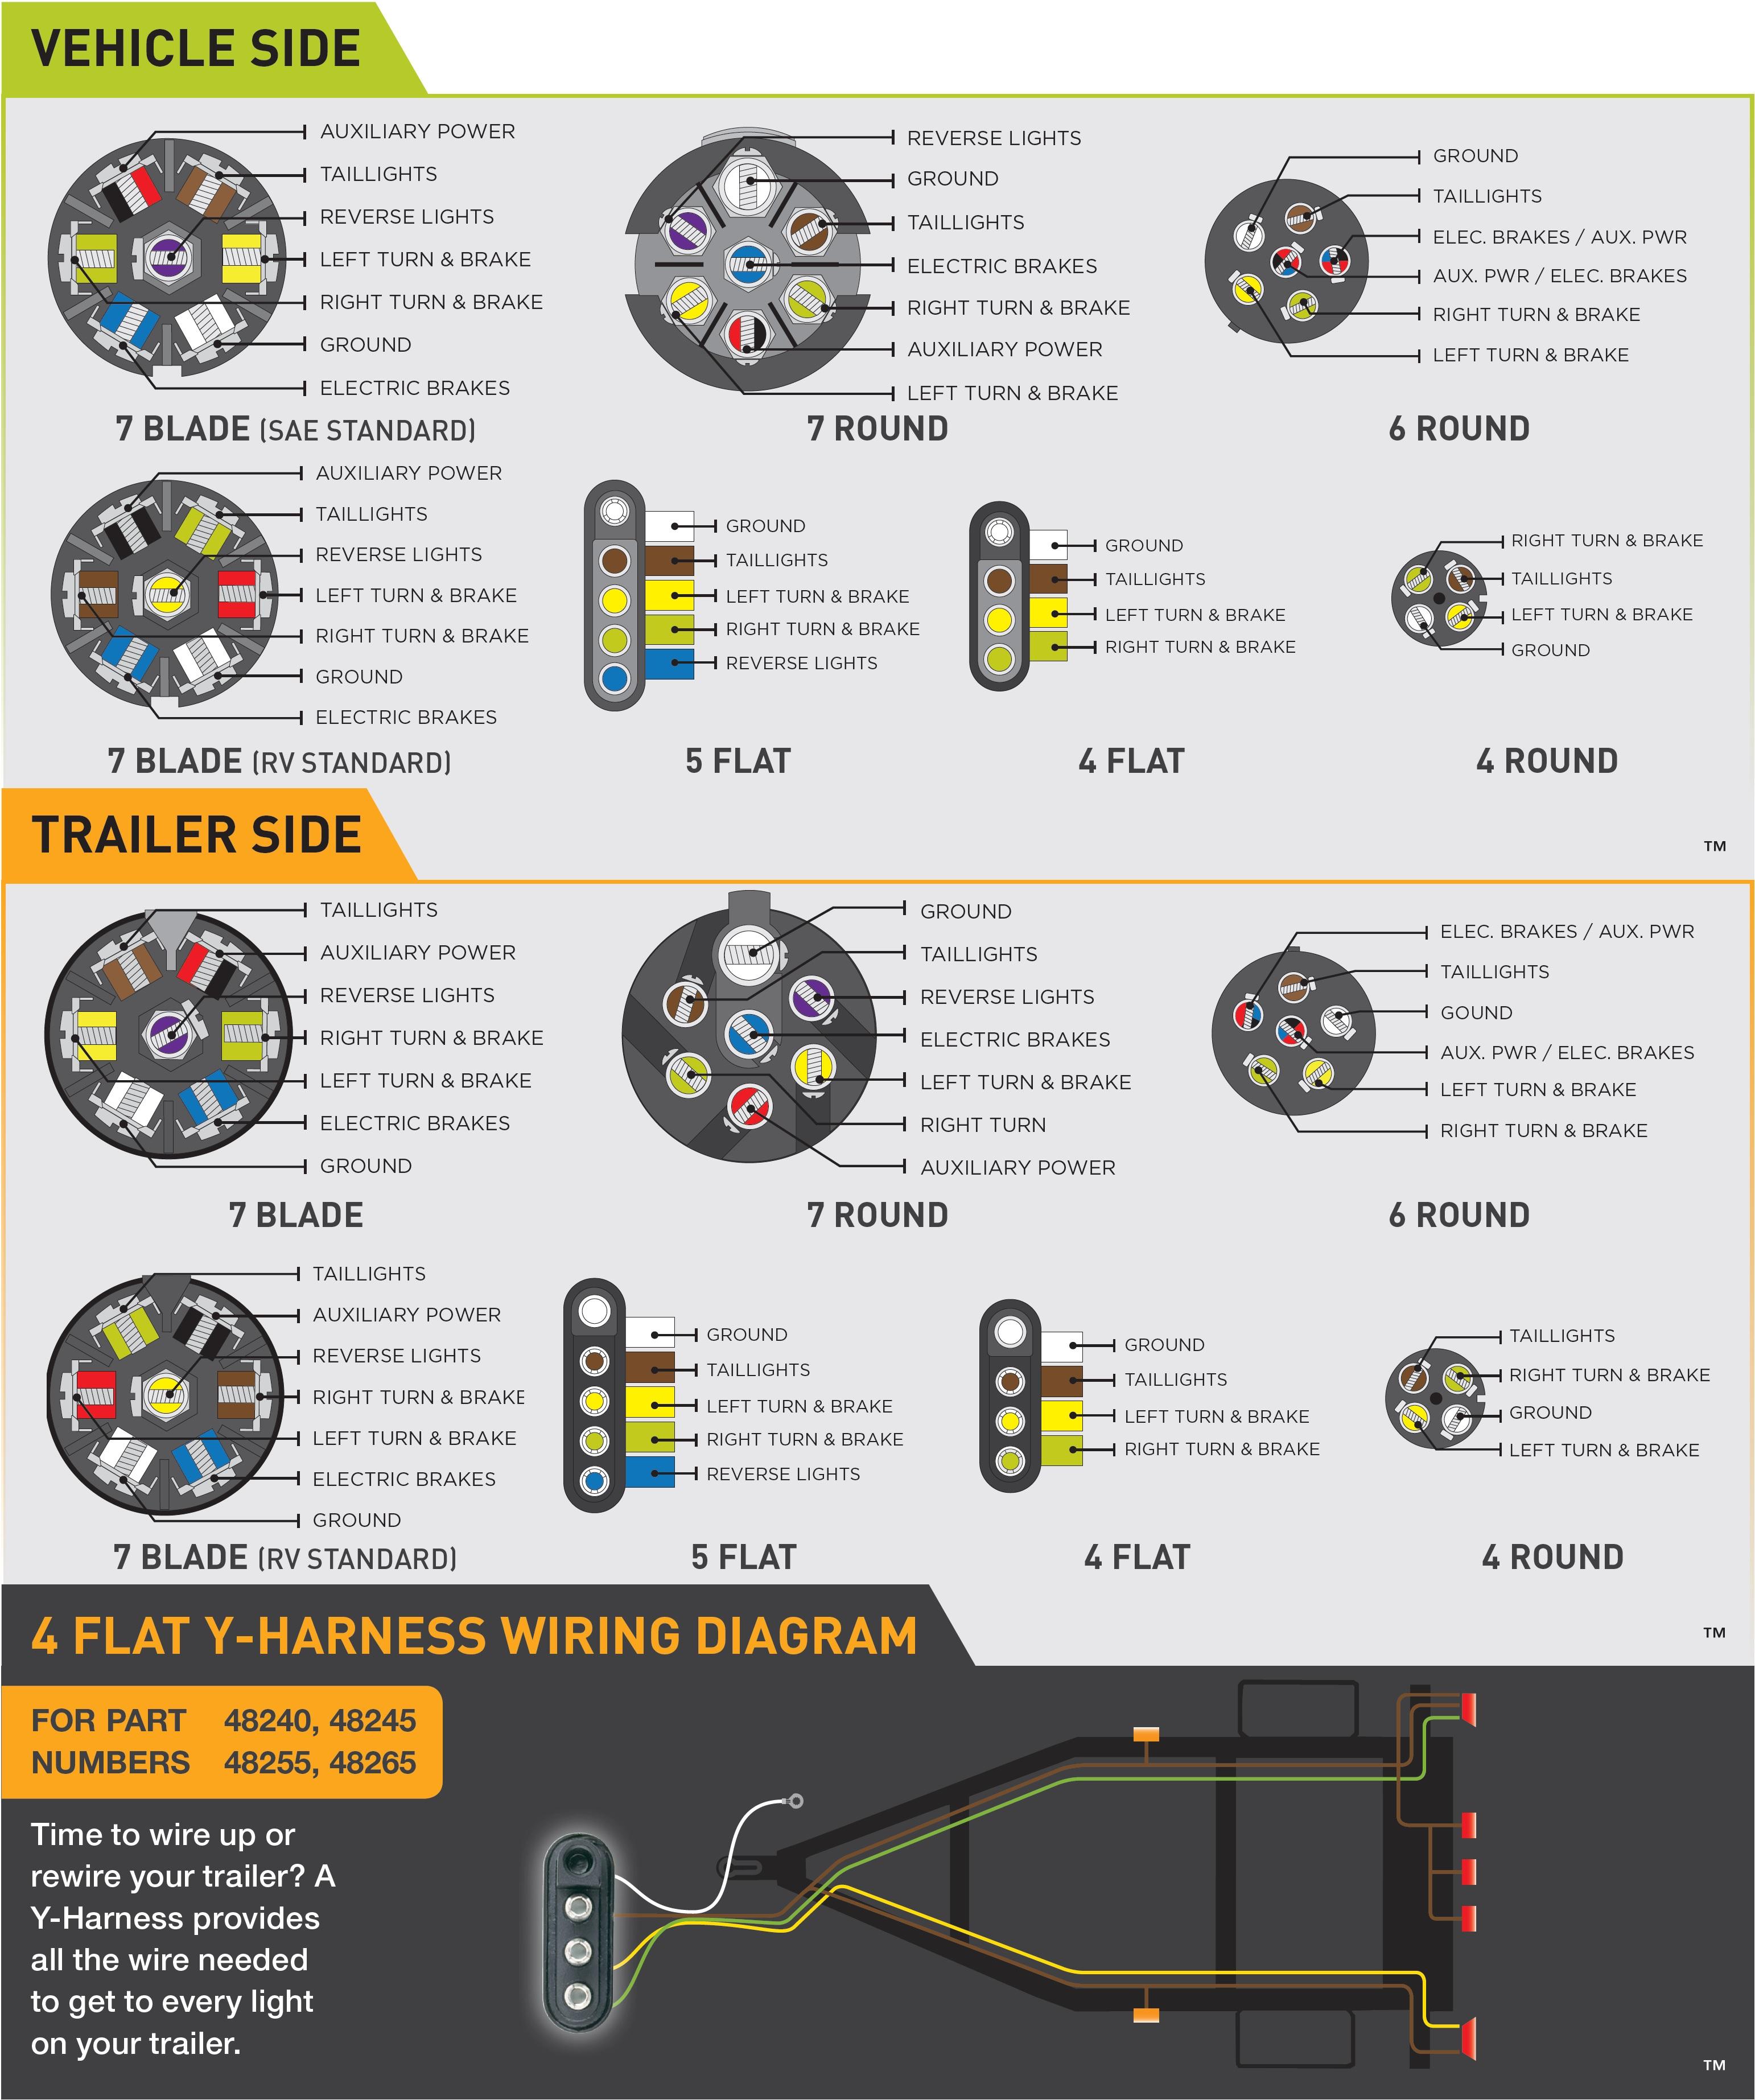 7 Pin Rv Wiring Diagram - Wiring Diagram Data Oreo - Ford F250 Trailer Wiring Harness Diagram